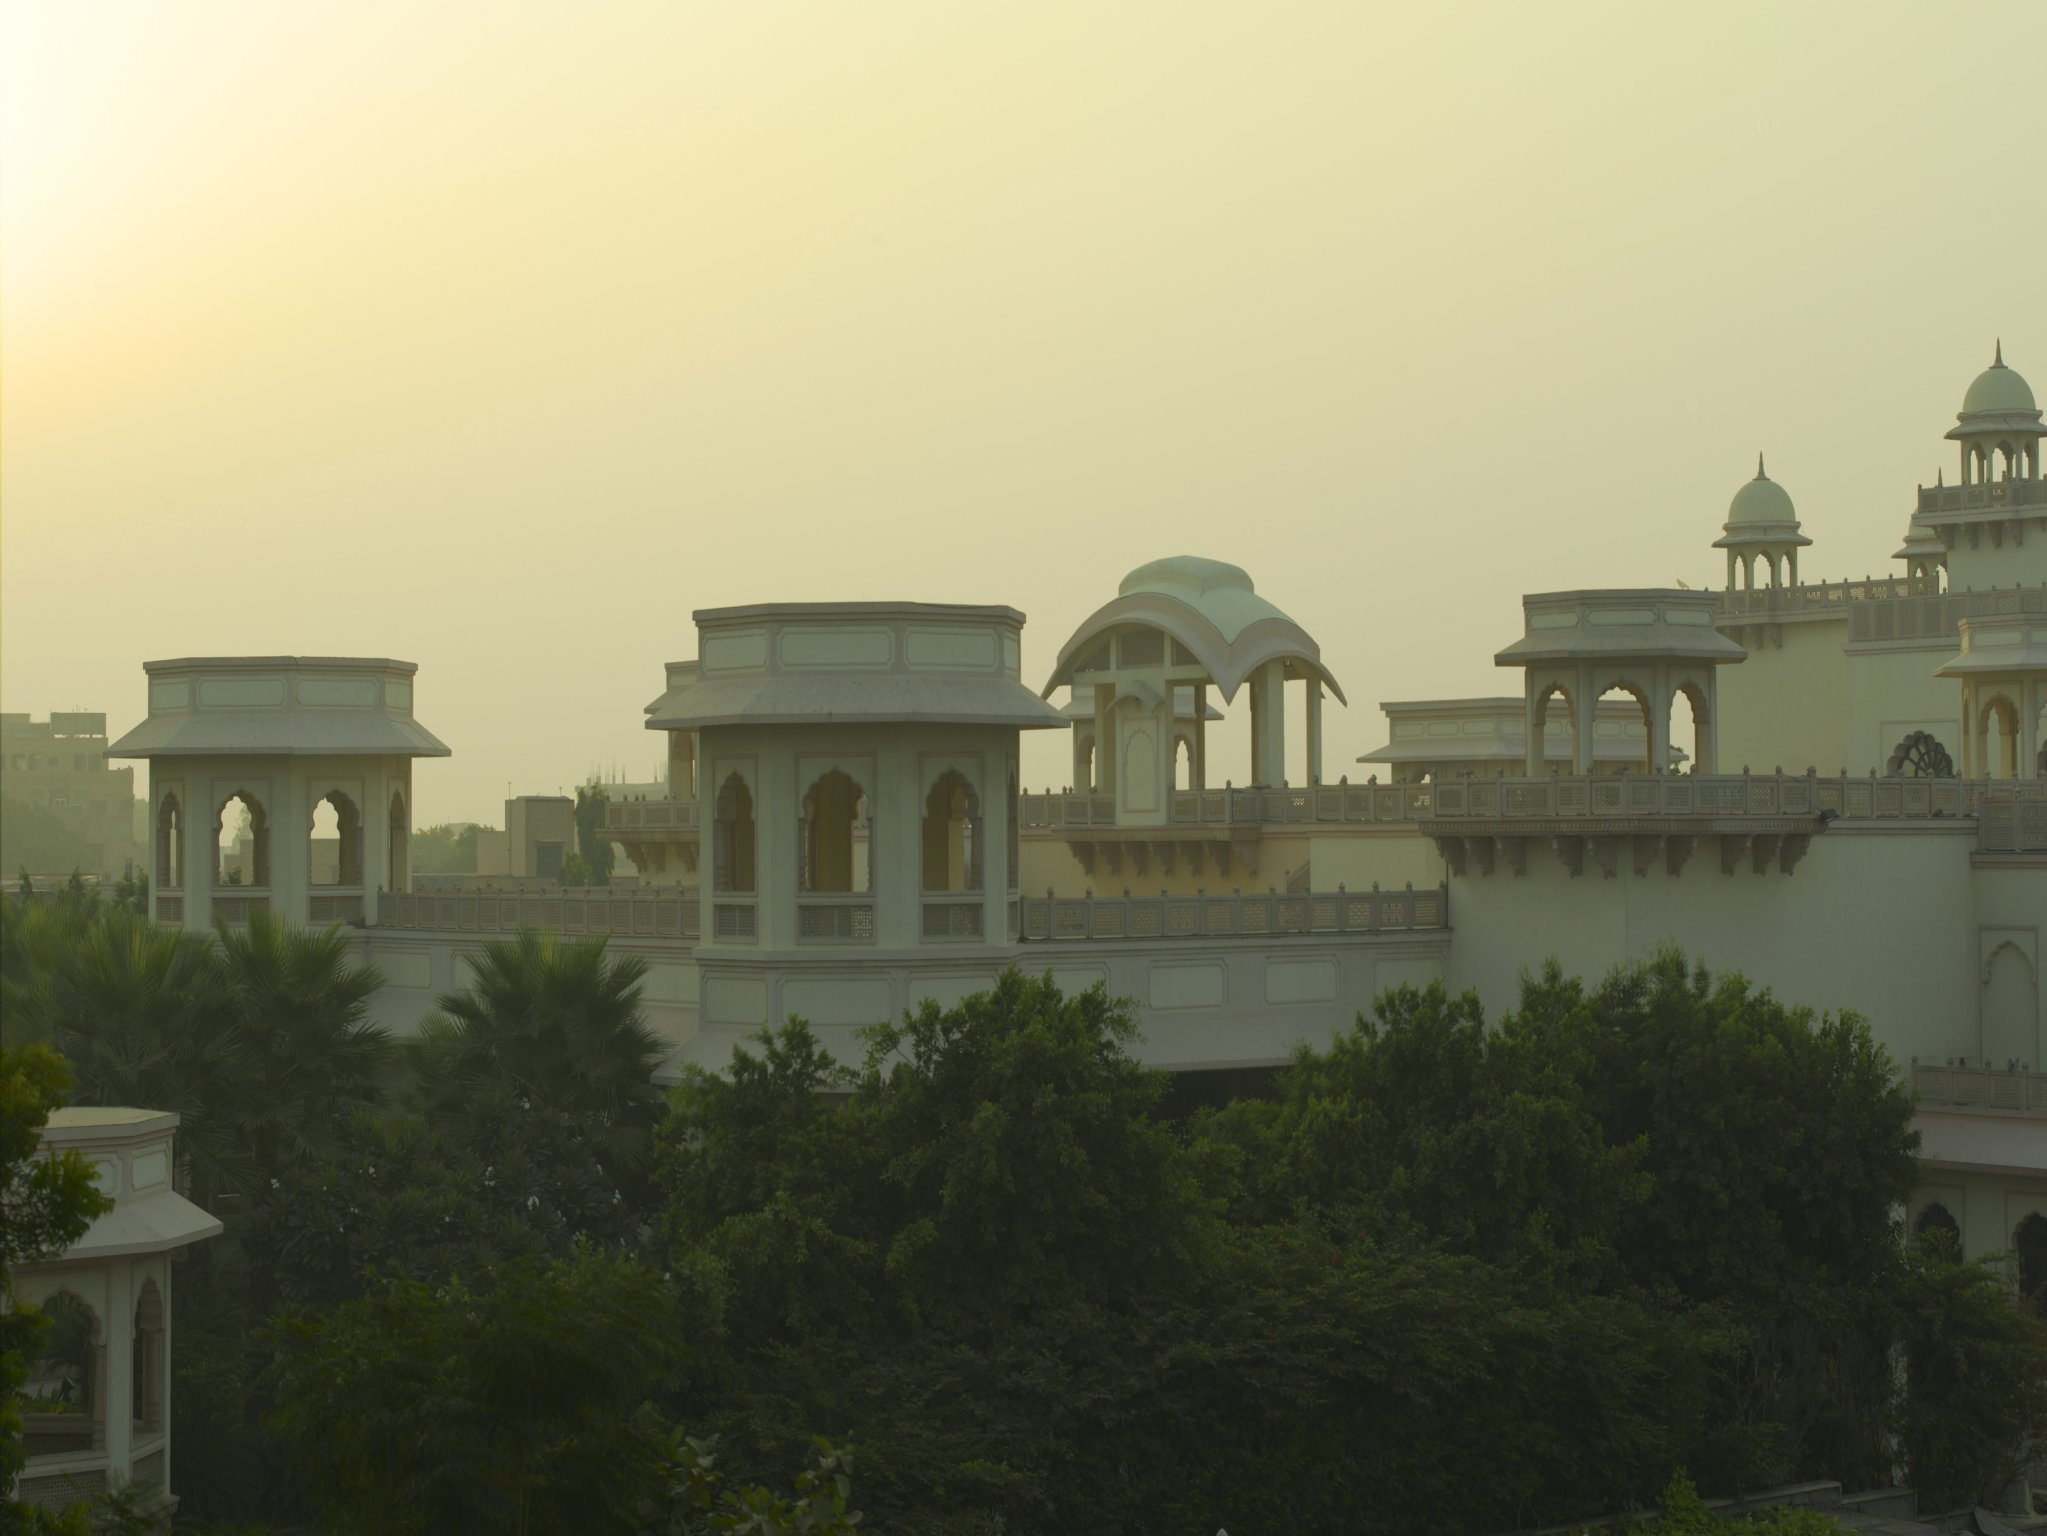 Vivanta by Taj - Hari Mahal, Jodhpur